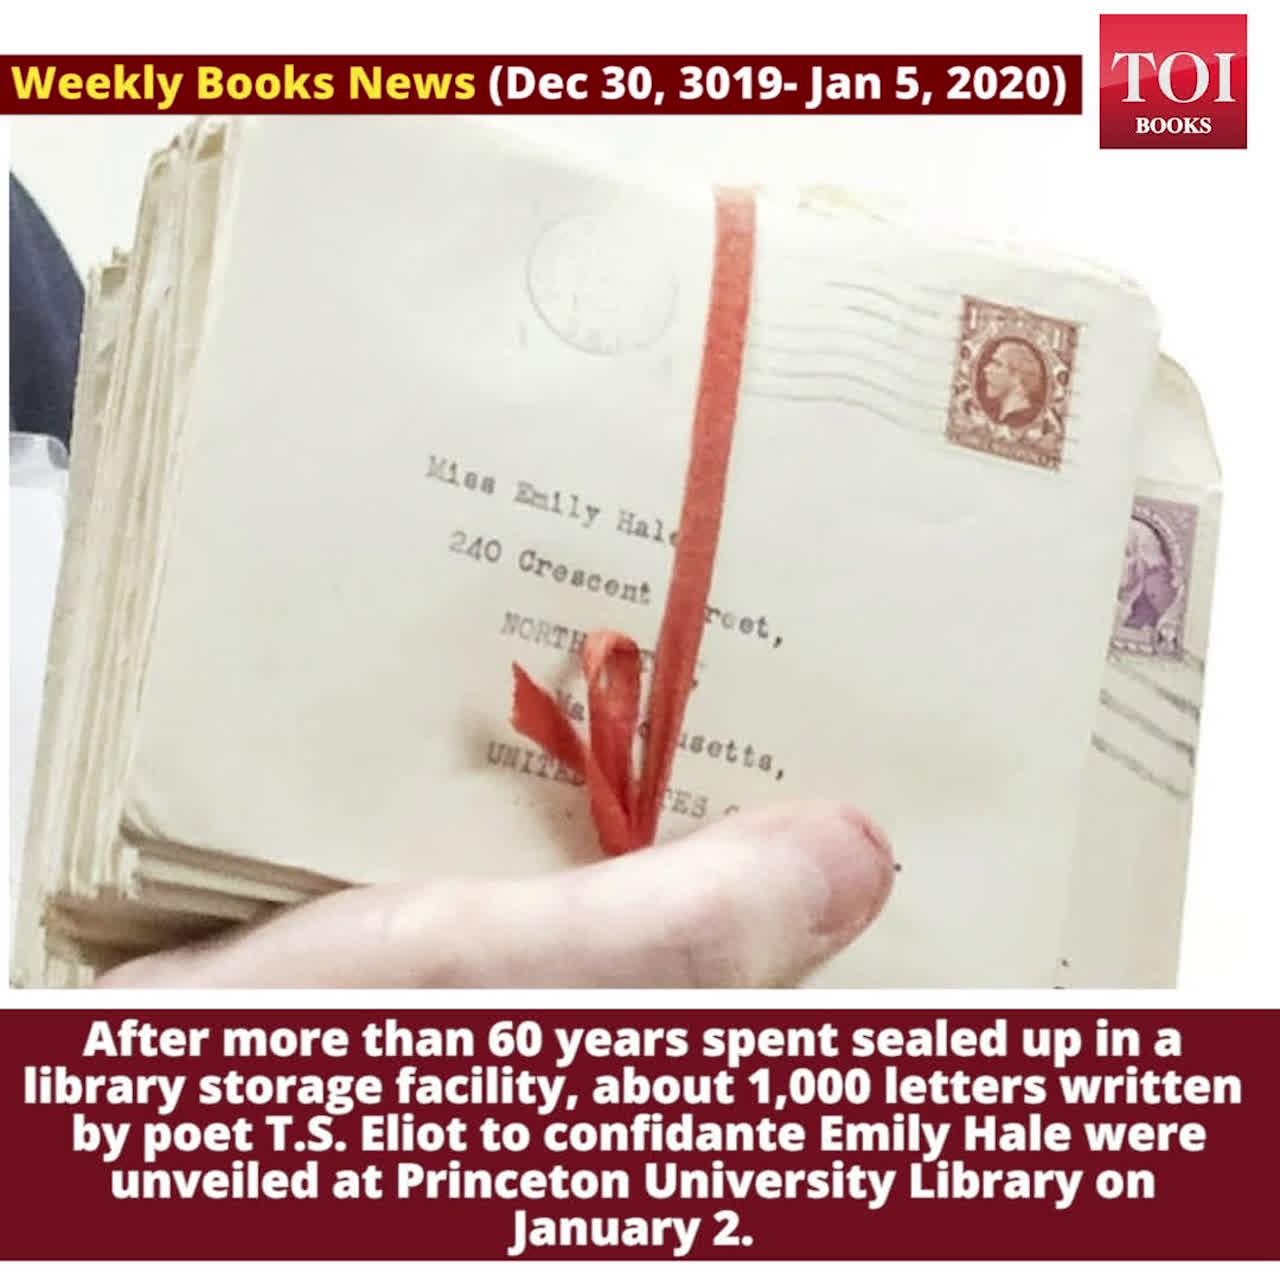 weekly-books-news-dec-30-3019-jan-5-2020